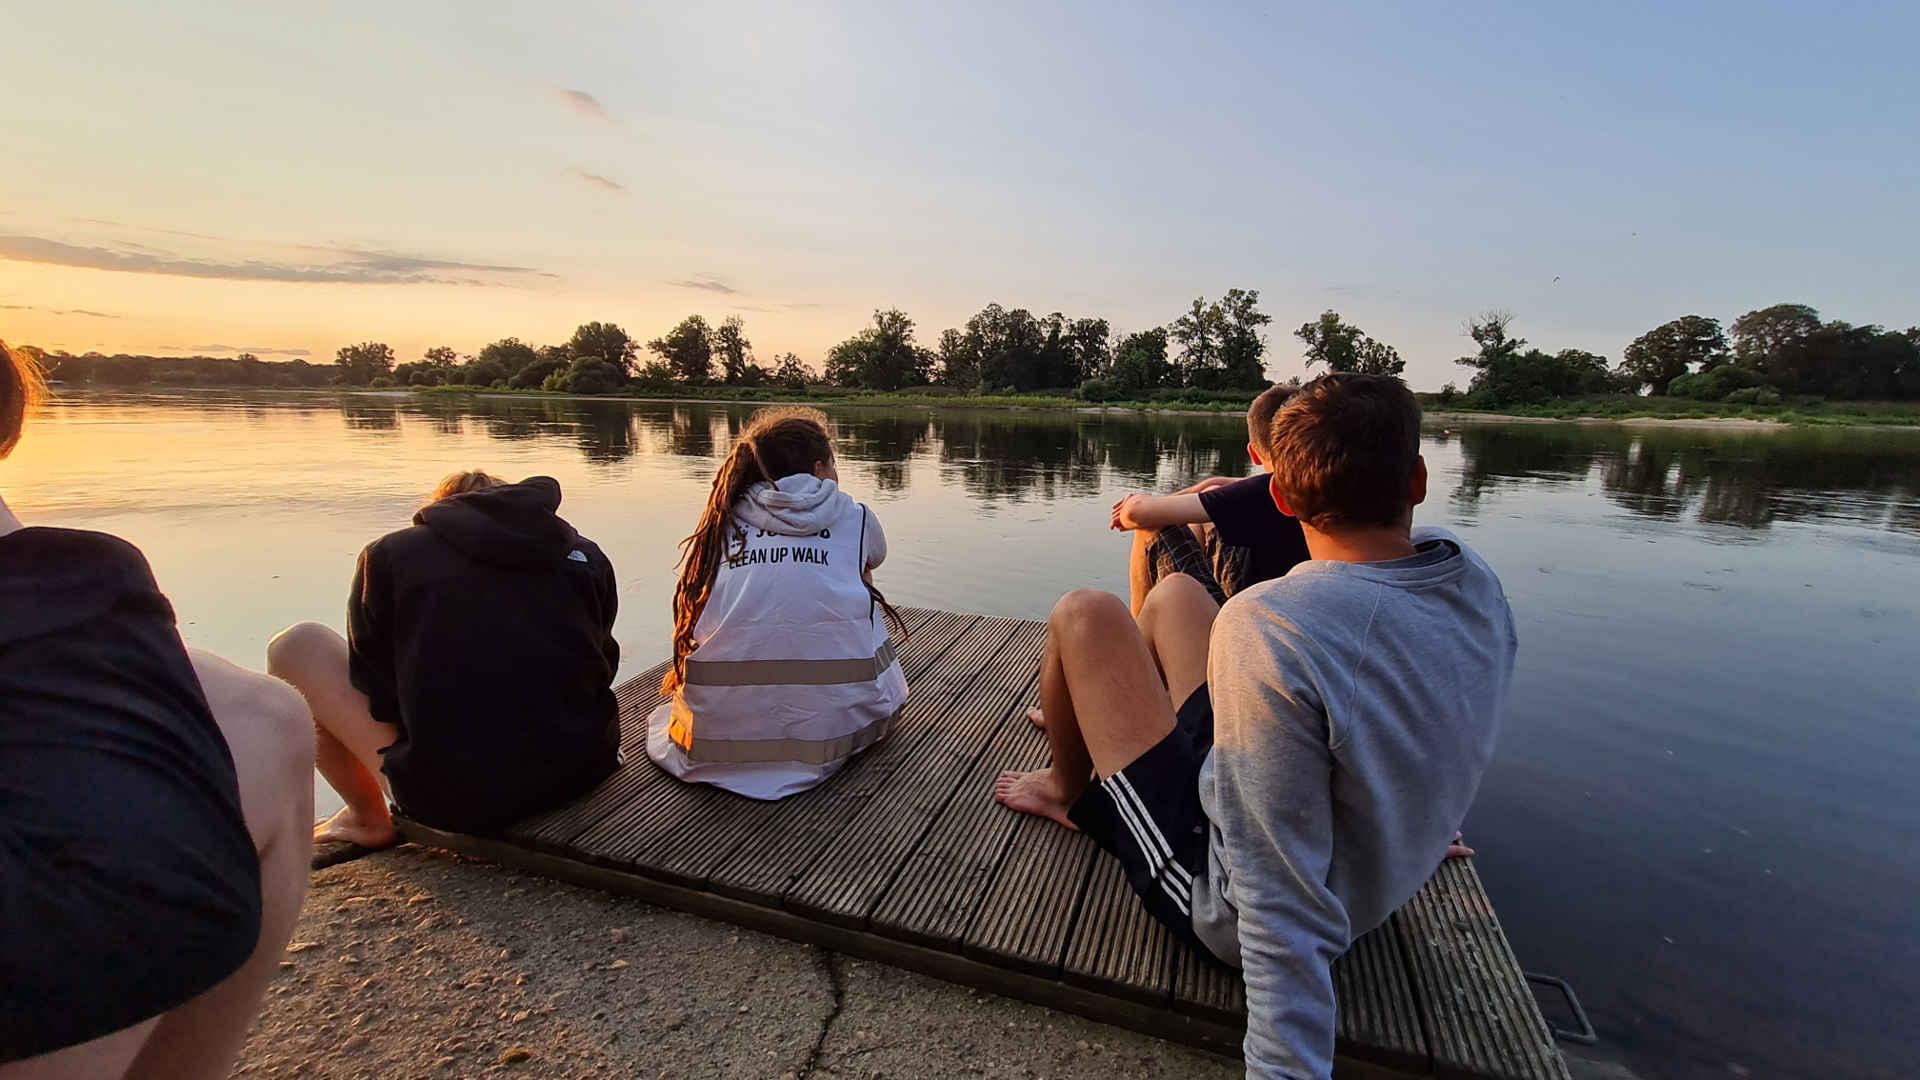 wwf jugend clean Up walk: Sonnenuntergang an der Elbe